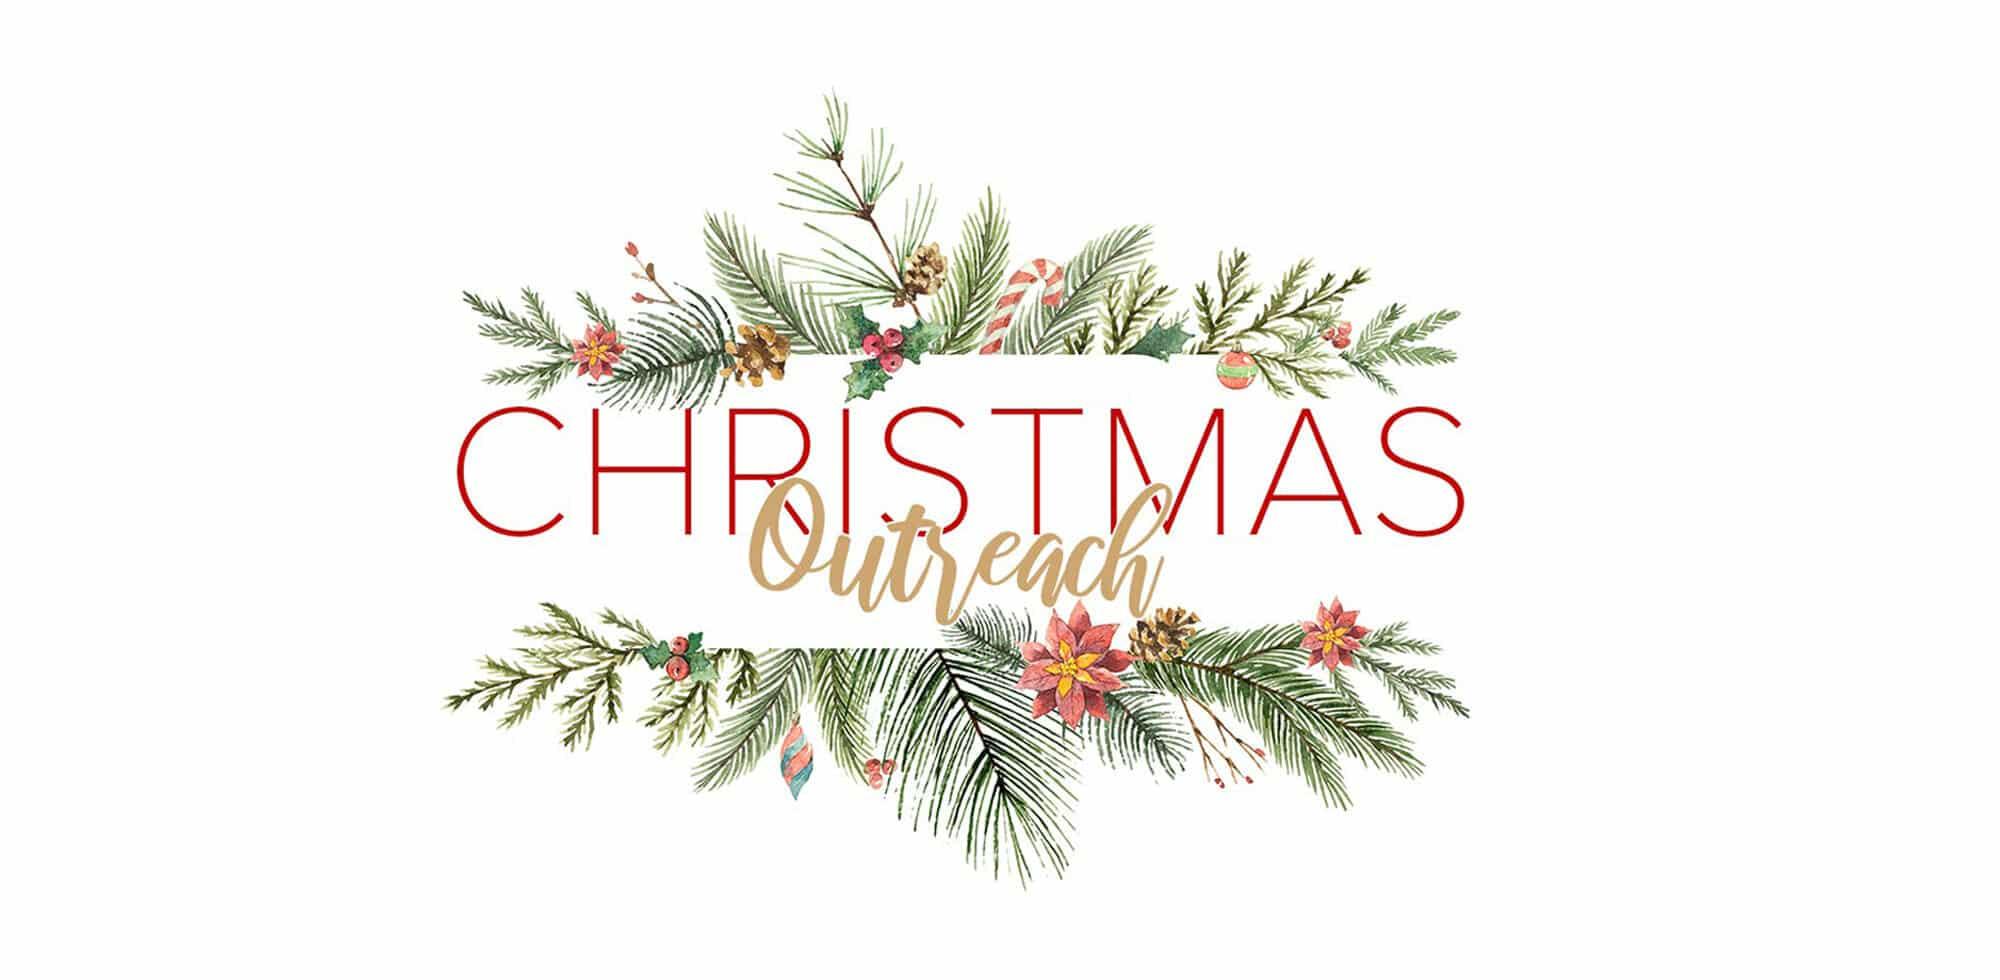 Christmas Outreach Banner